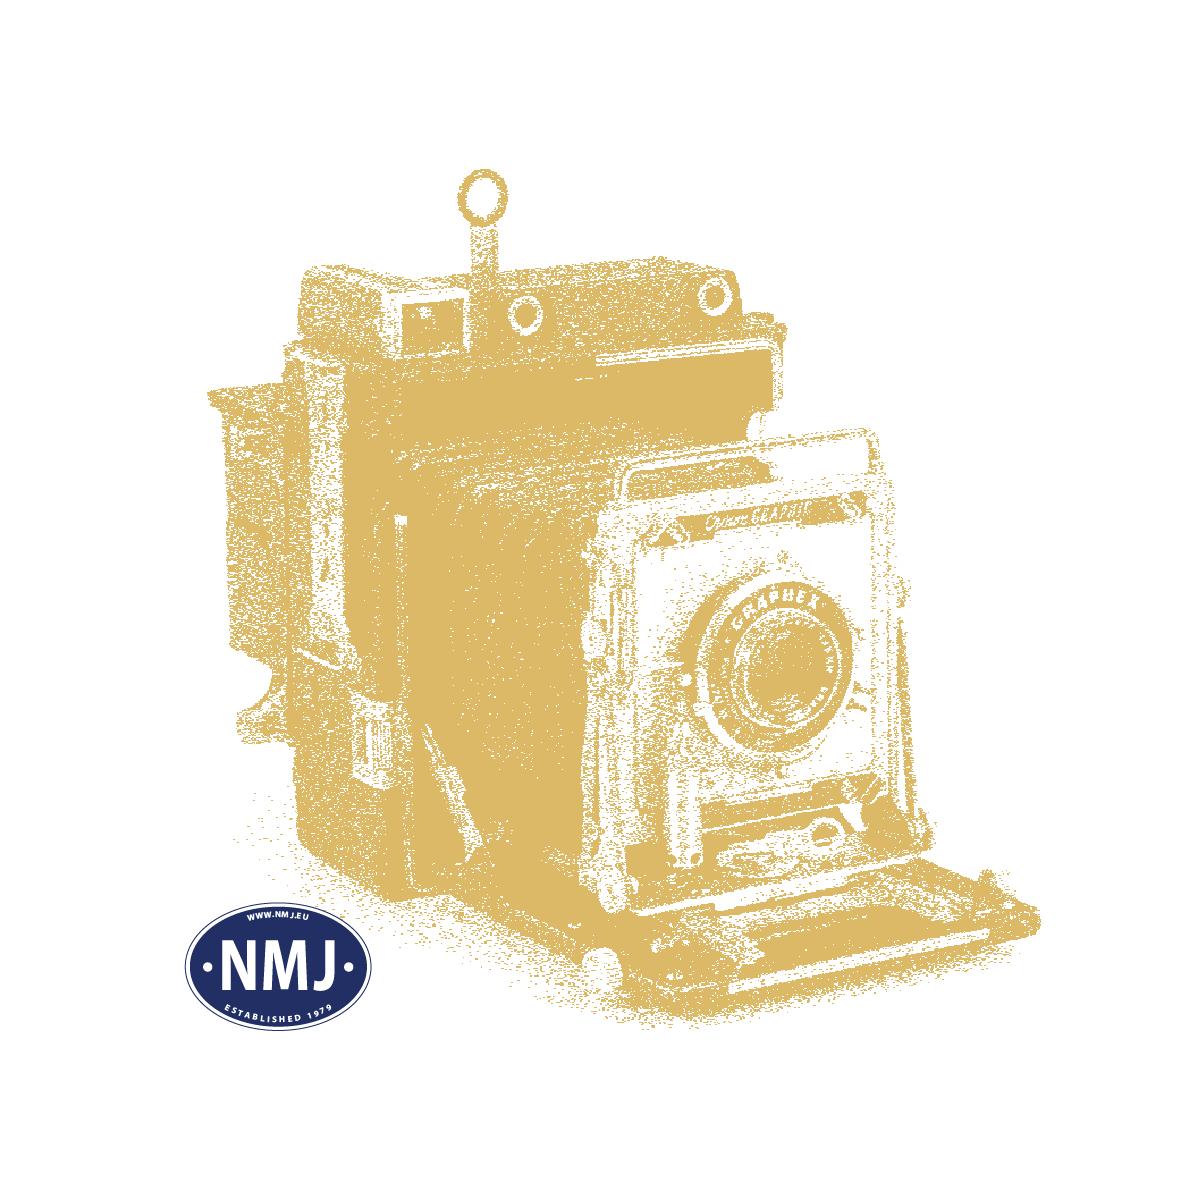 NMJT202.502 - NMJ Topline SJ S11 4880 Kino og Bistrovogn, Rød/Sort